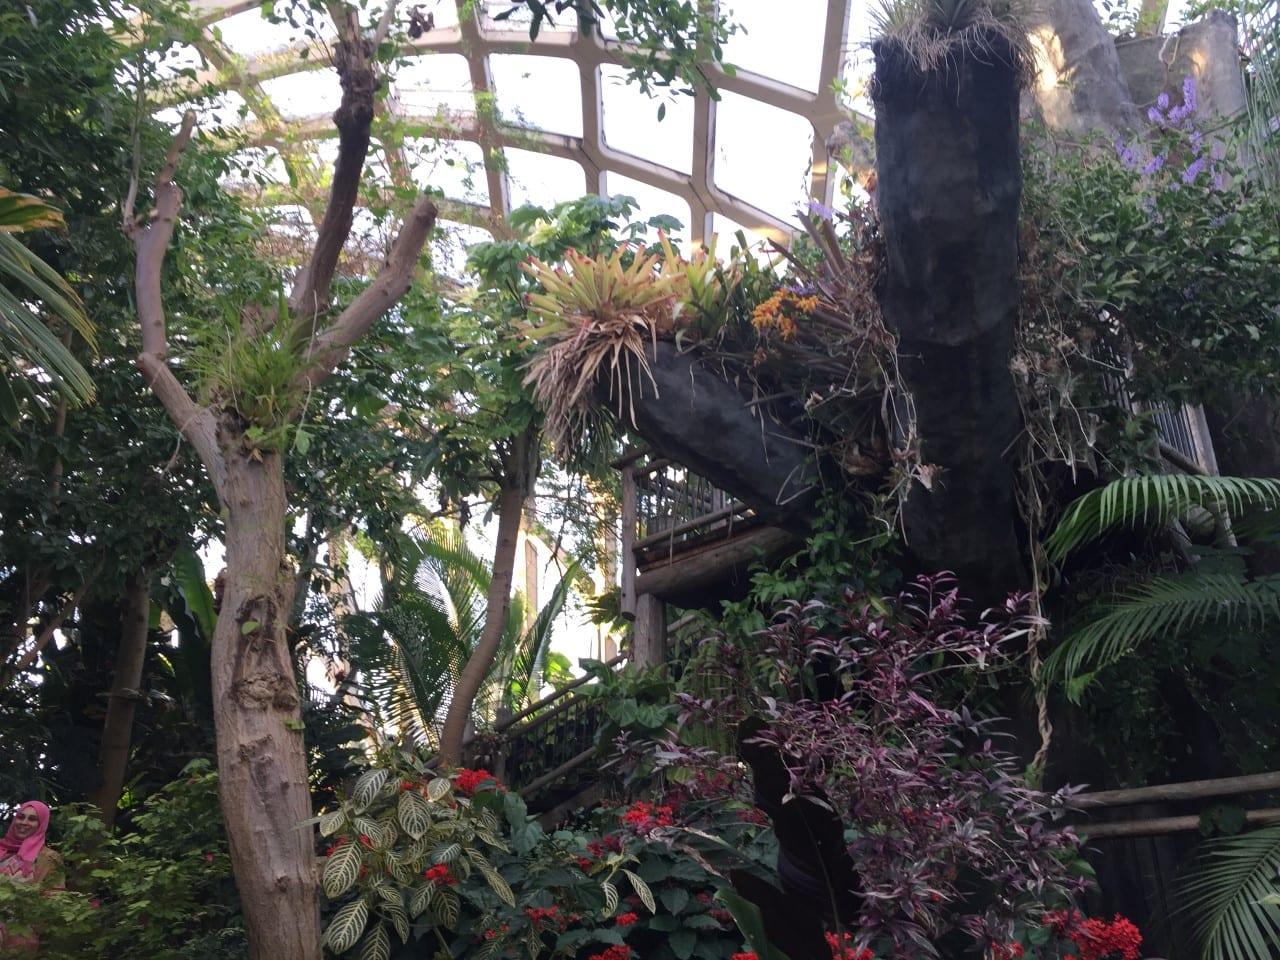 Denver Botanic Gardens Dome Plants